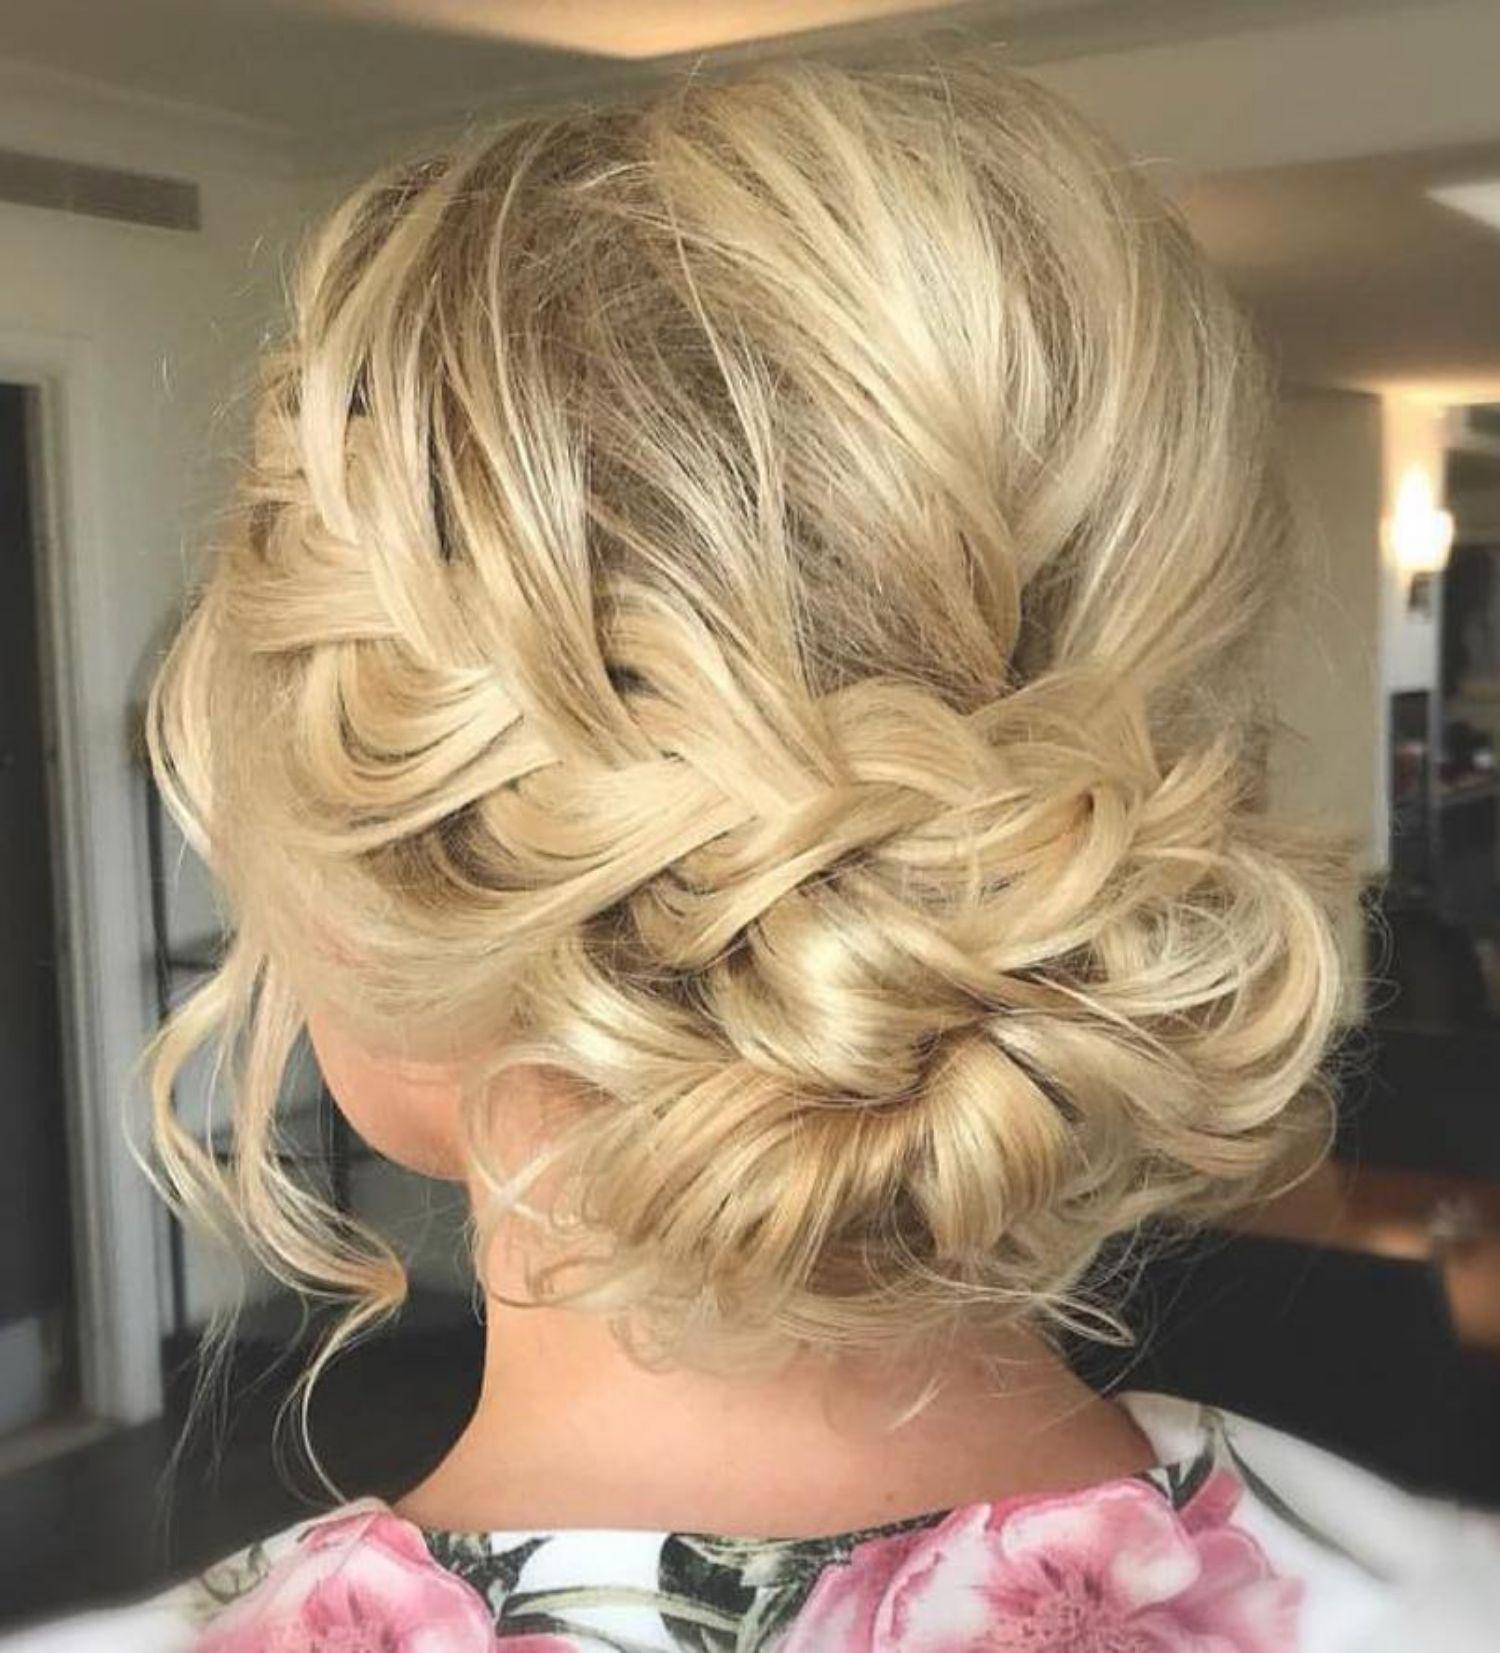 Low Updo With A Braid Medium Length Hair Styles Updos For Medium Length Hair Hair Lengths